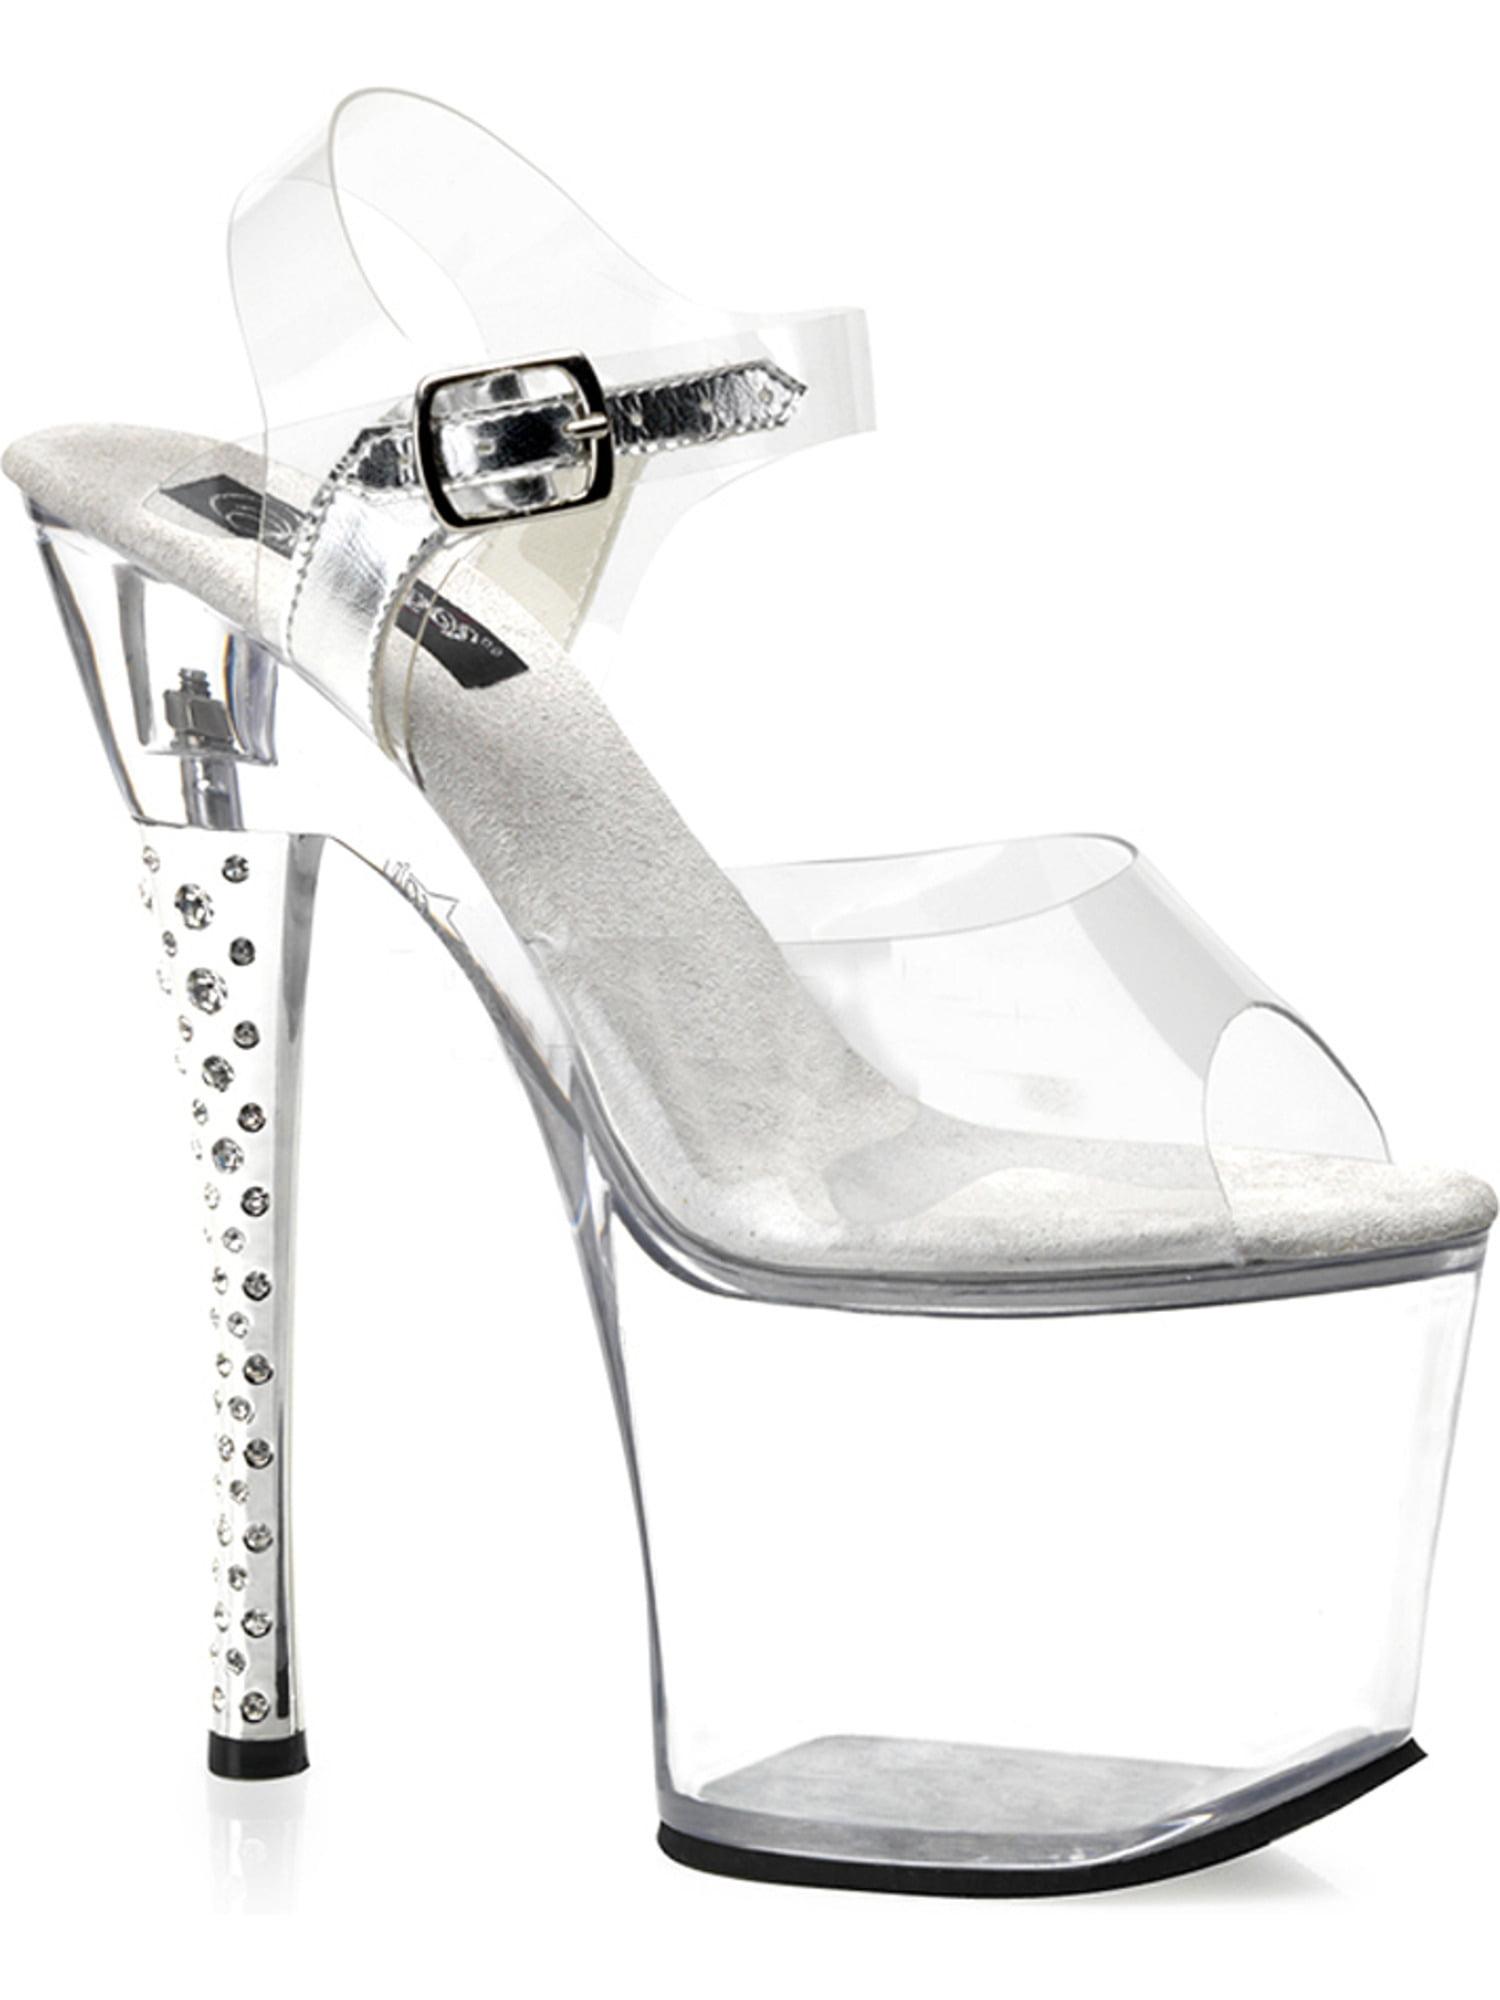 7 Inch Sexy Platform Shoes Rhinestone Heel High Platform Clear Sandals